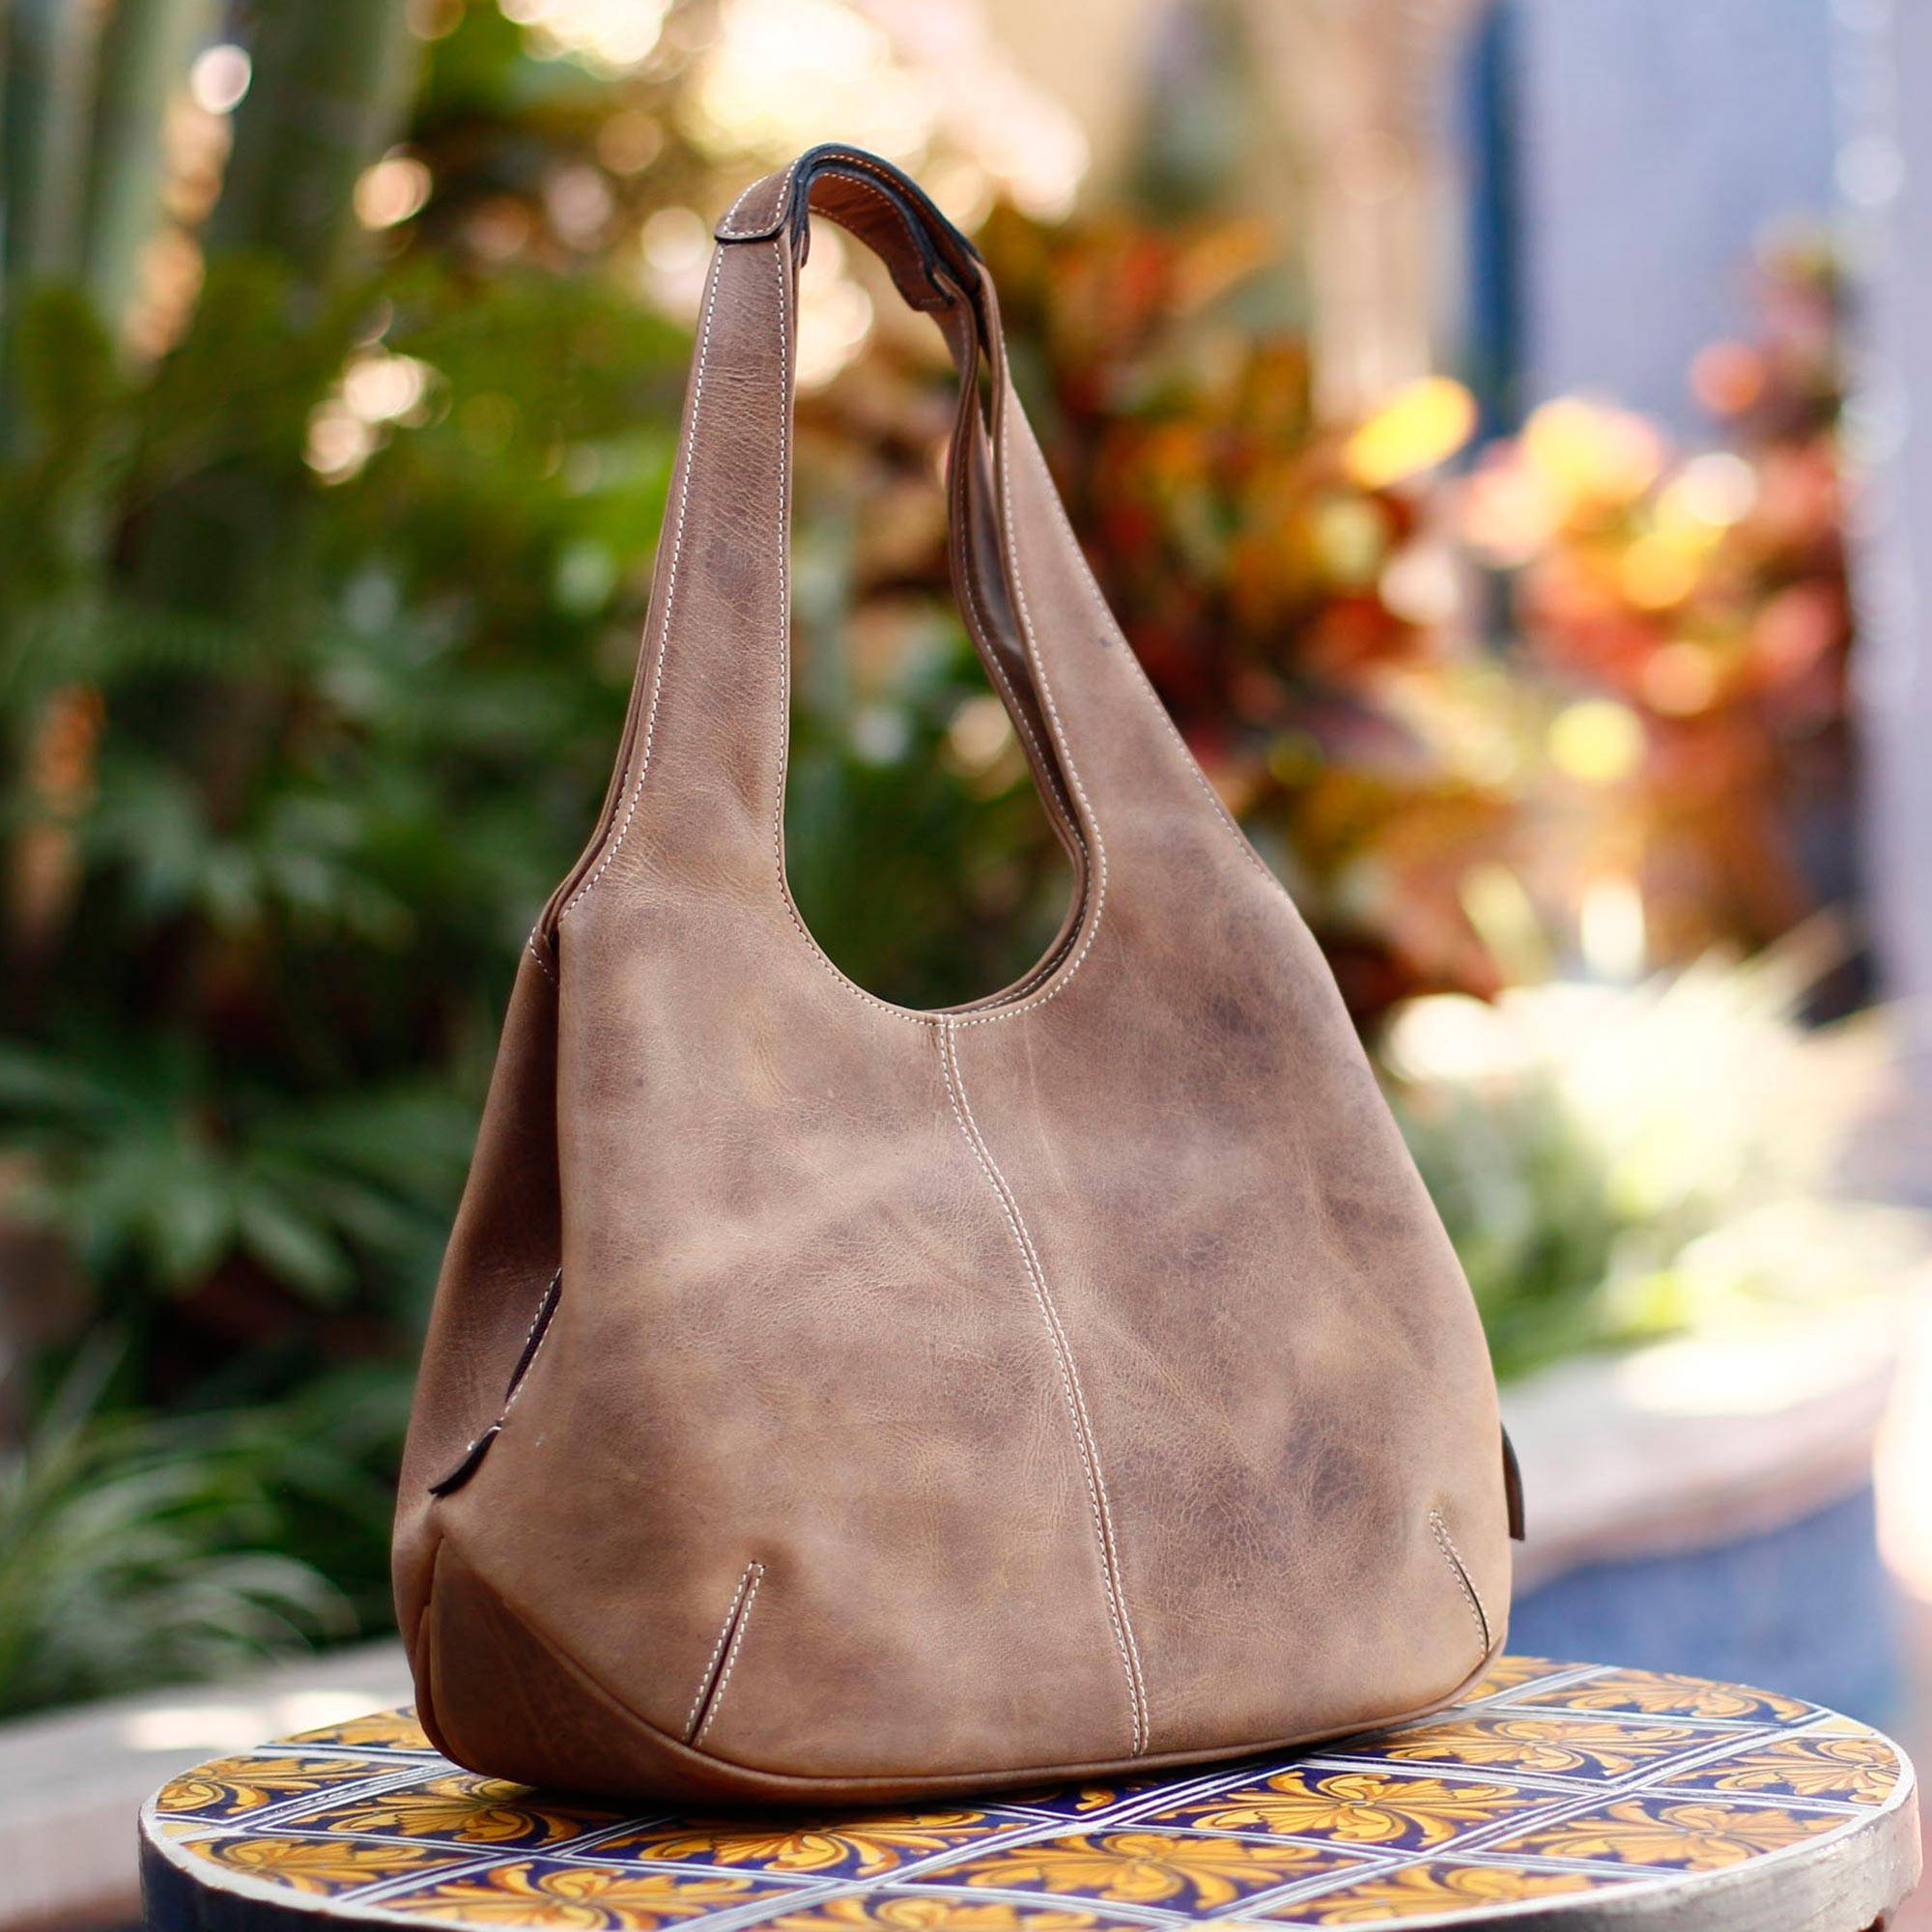 cffeb1c0e155 Women S Leather Hobo Handbag From Mexico Urban Caramel Novica. Hobo Lauren. Brown  Soft ...